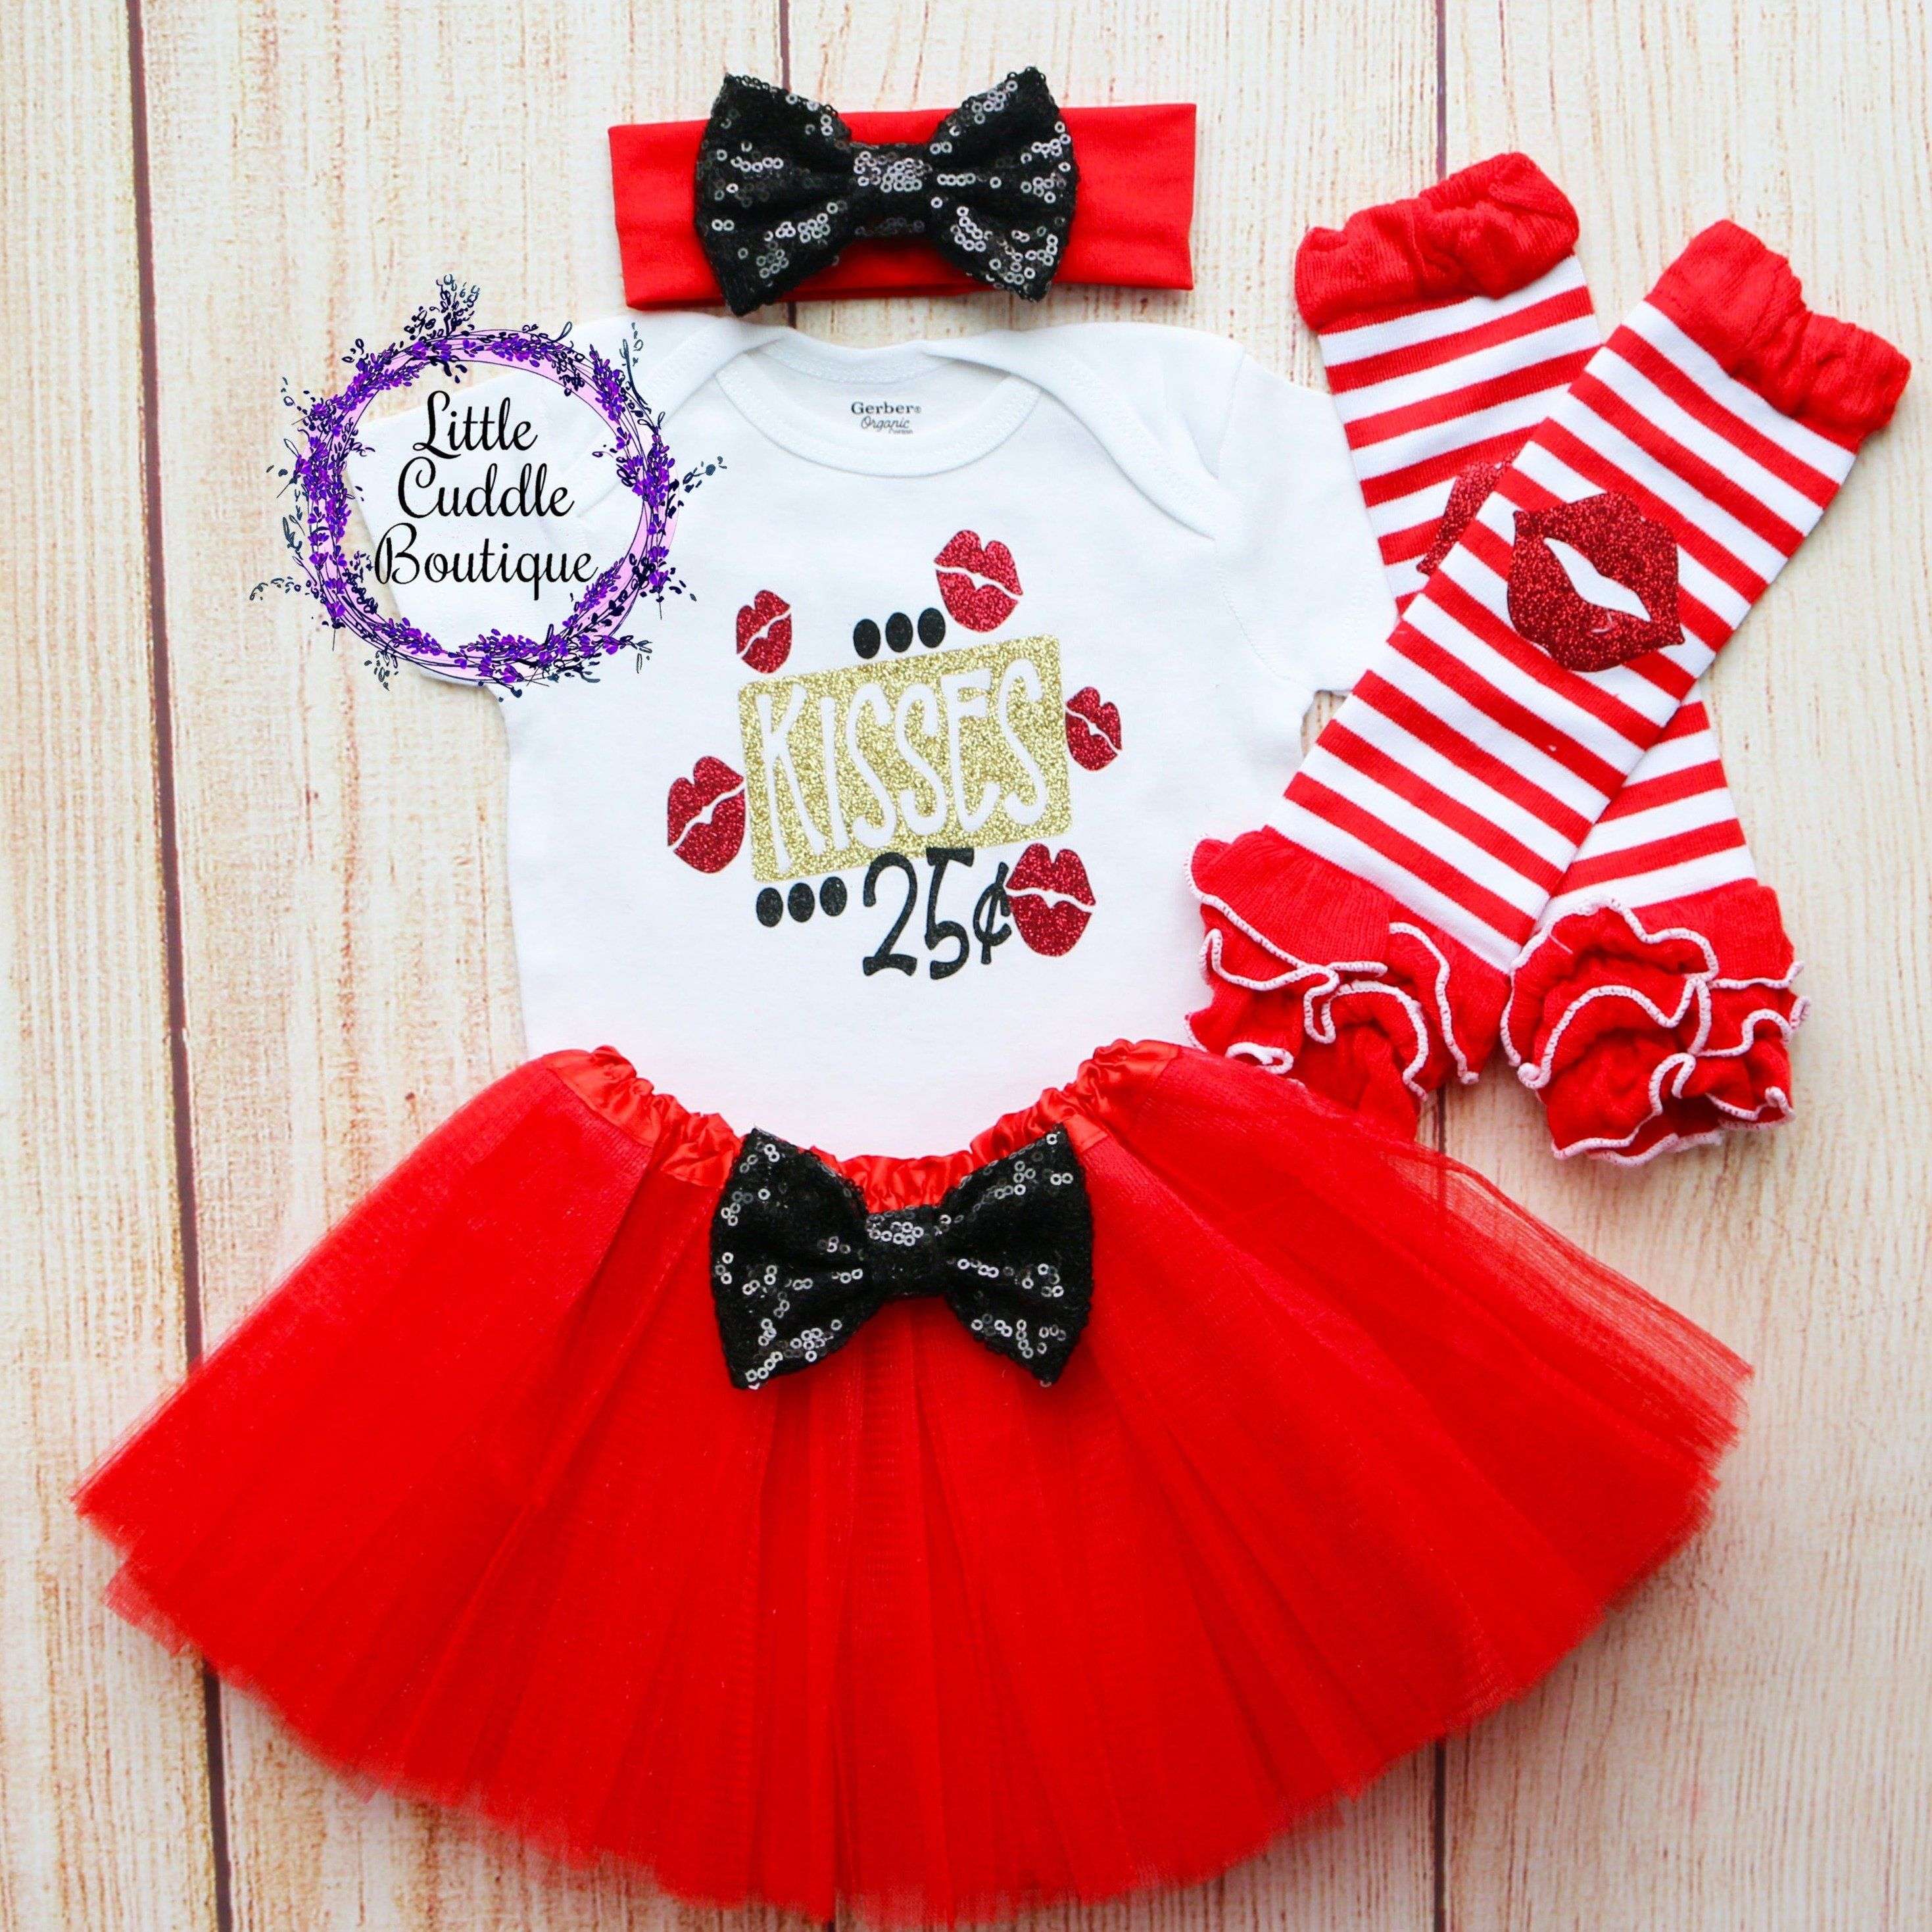 25cent Kisses Valentines Day Sequin Bow Headband